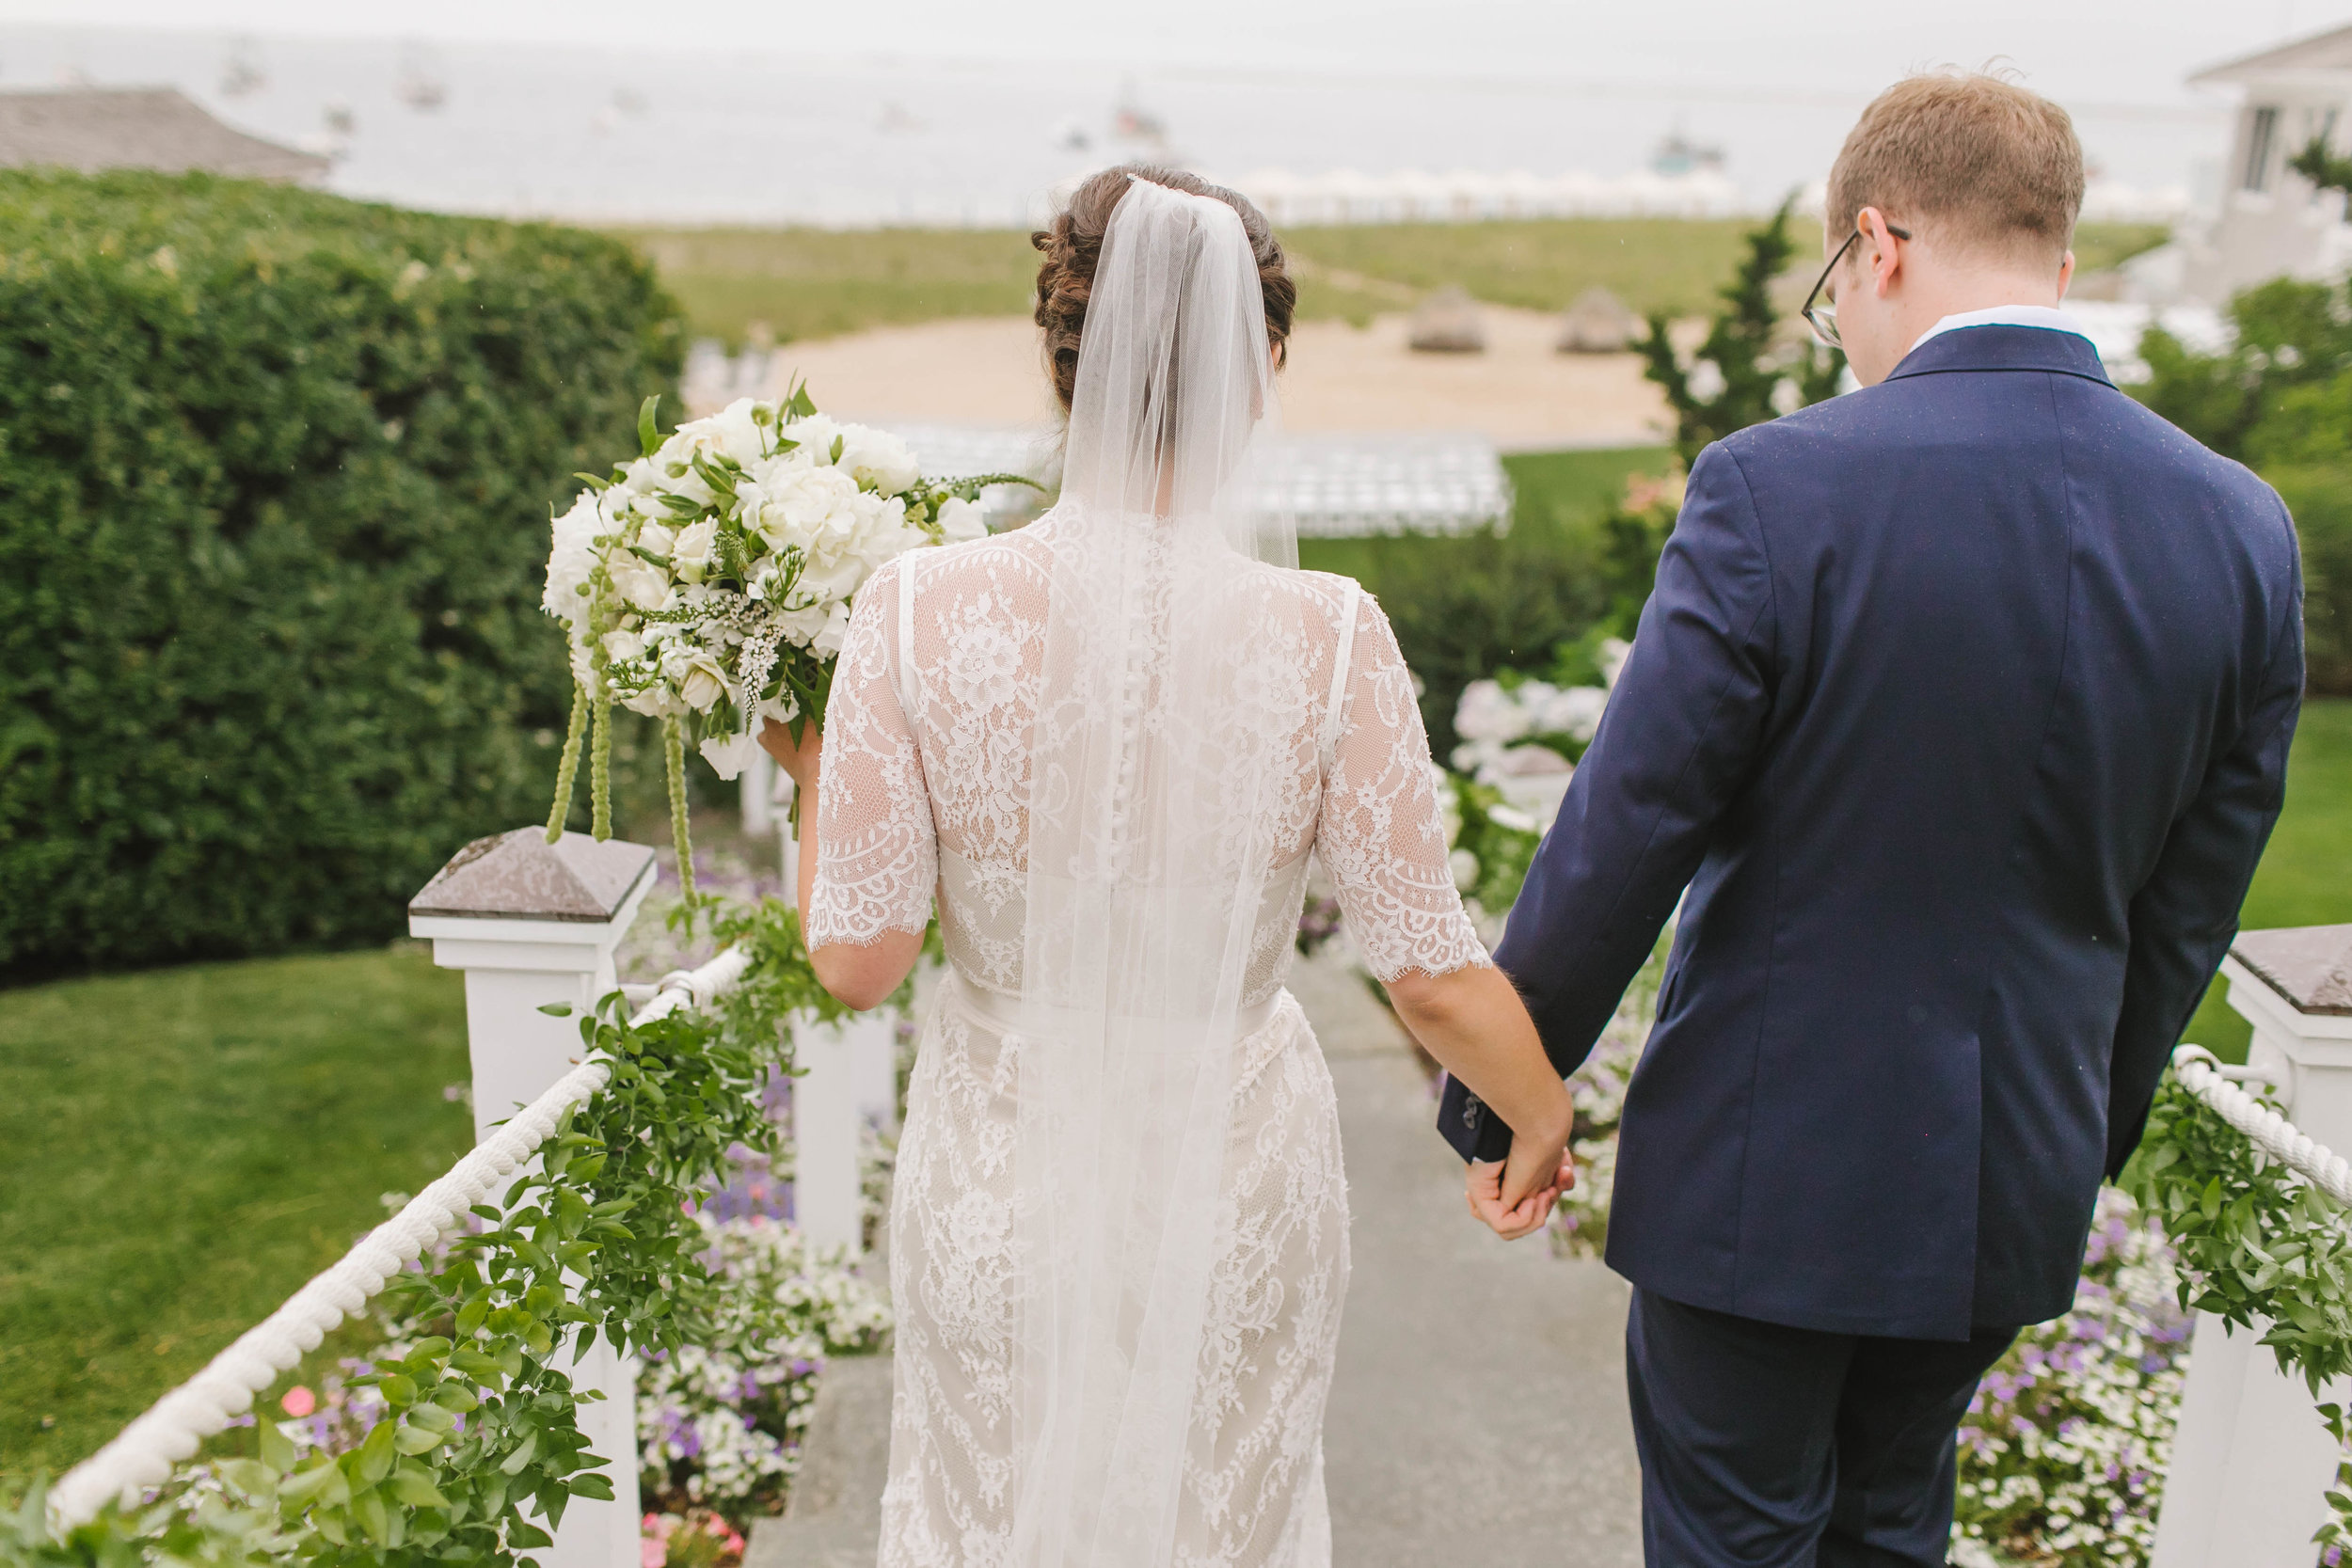 Chatham Bars Inn Cape Cod MA Rain Rainy Wedding with Dog - Emily Tebbetts Photography-5.jpg